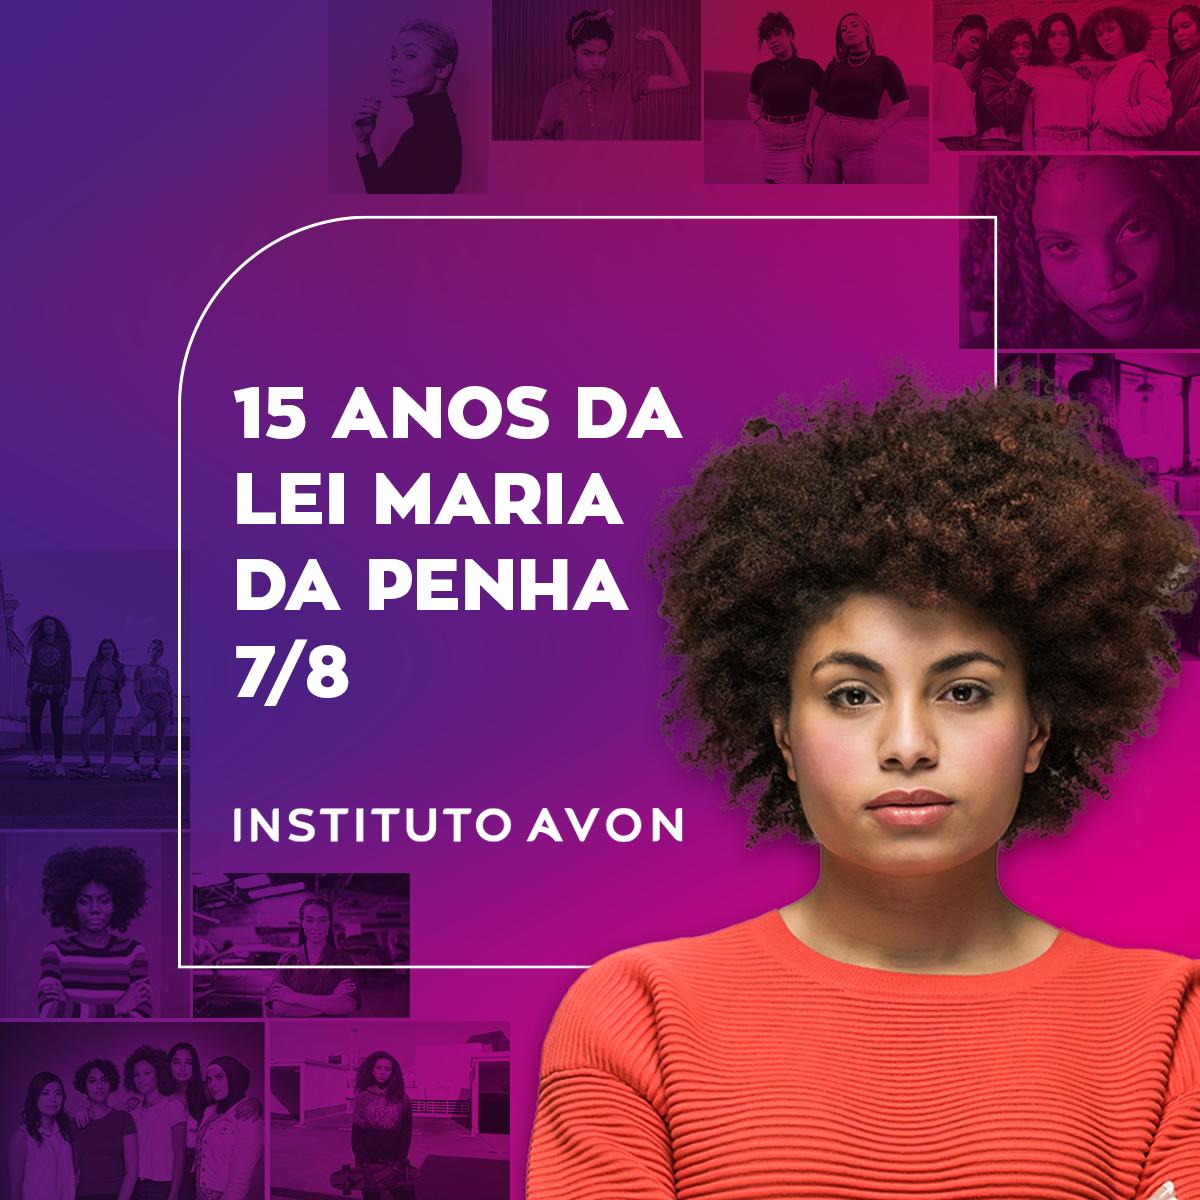 https://institutoavon.org.br/wp-content/uploads/2021/08/Lei-Maria-da-Penha-2.png